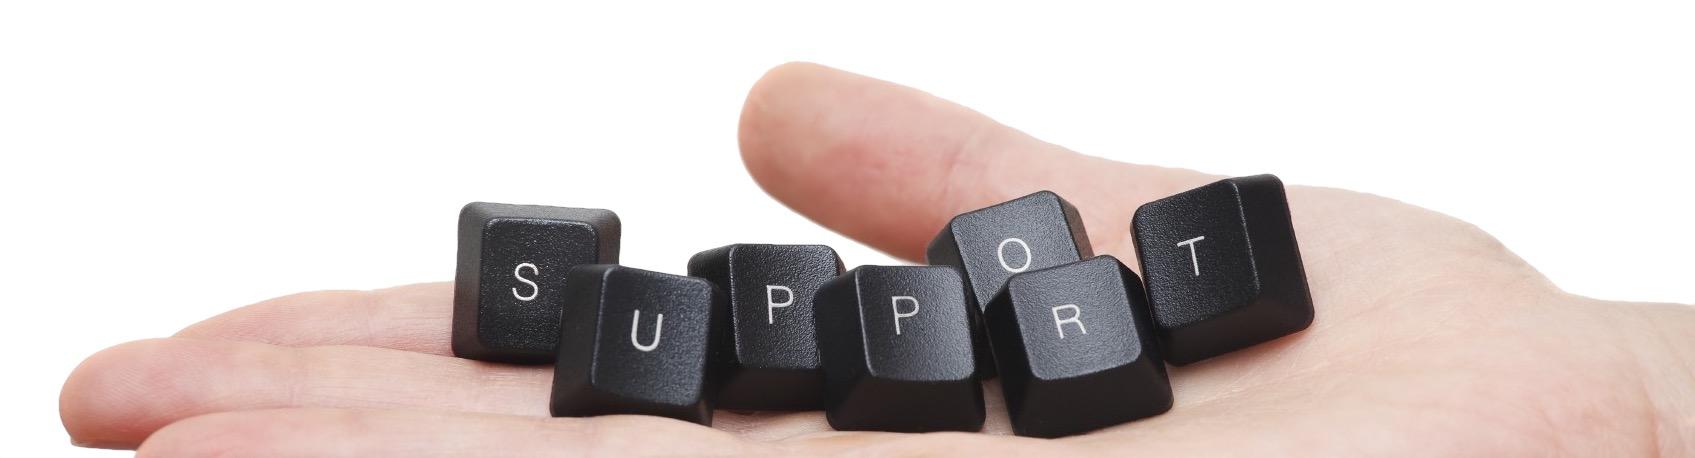 support e-tpe